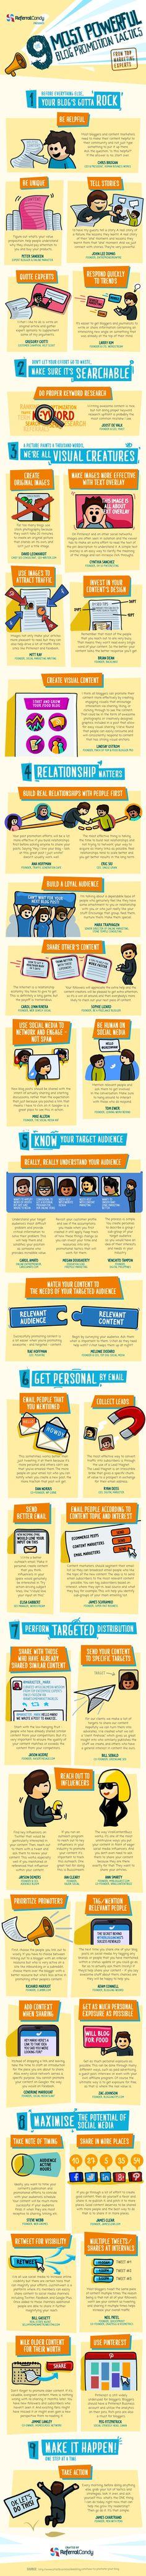 Blog Promotion Tactics Infographic (Scheduled via TrafficWonker.com)